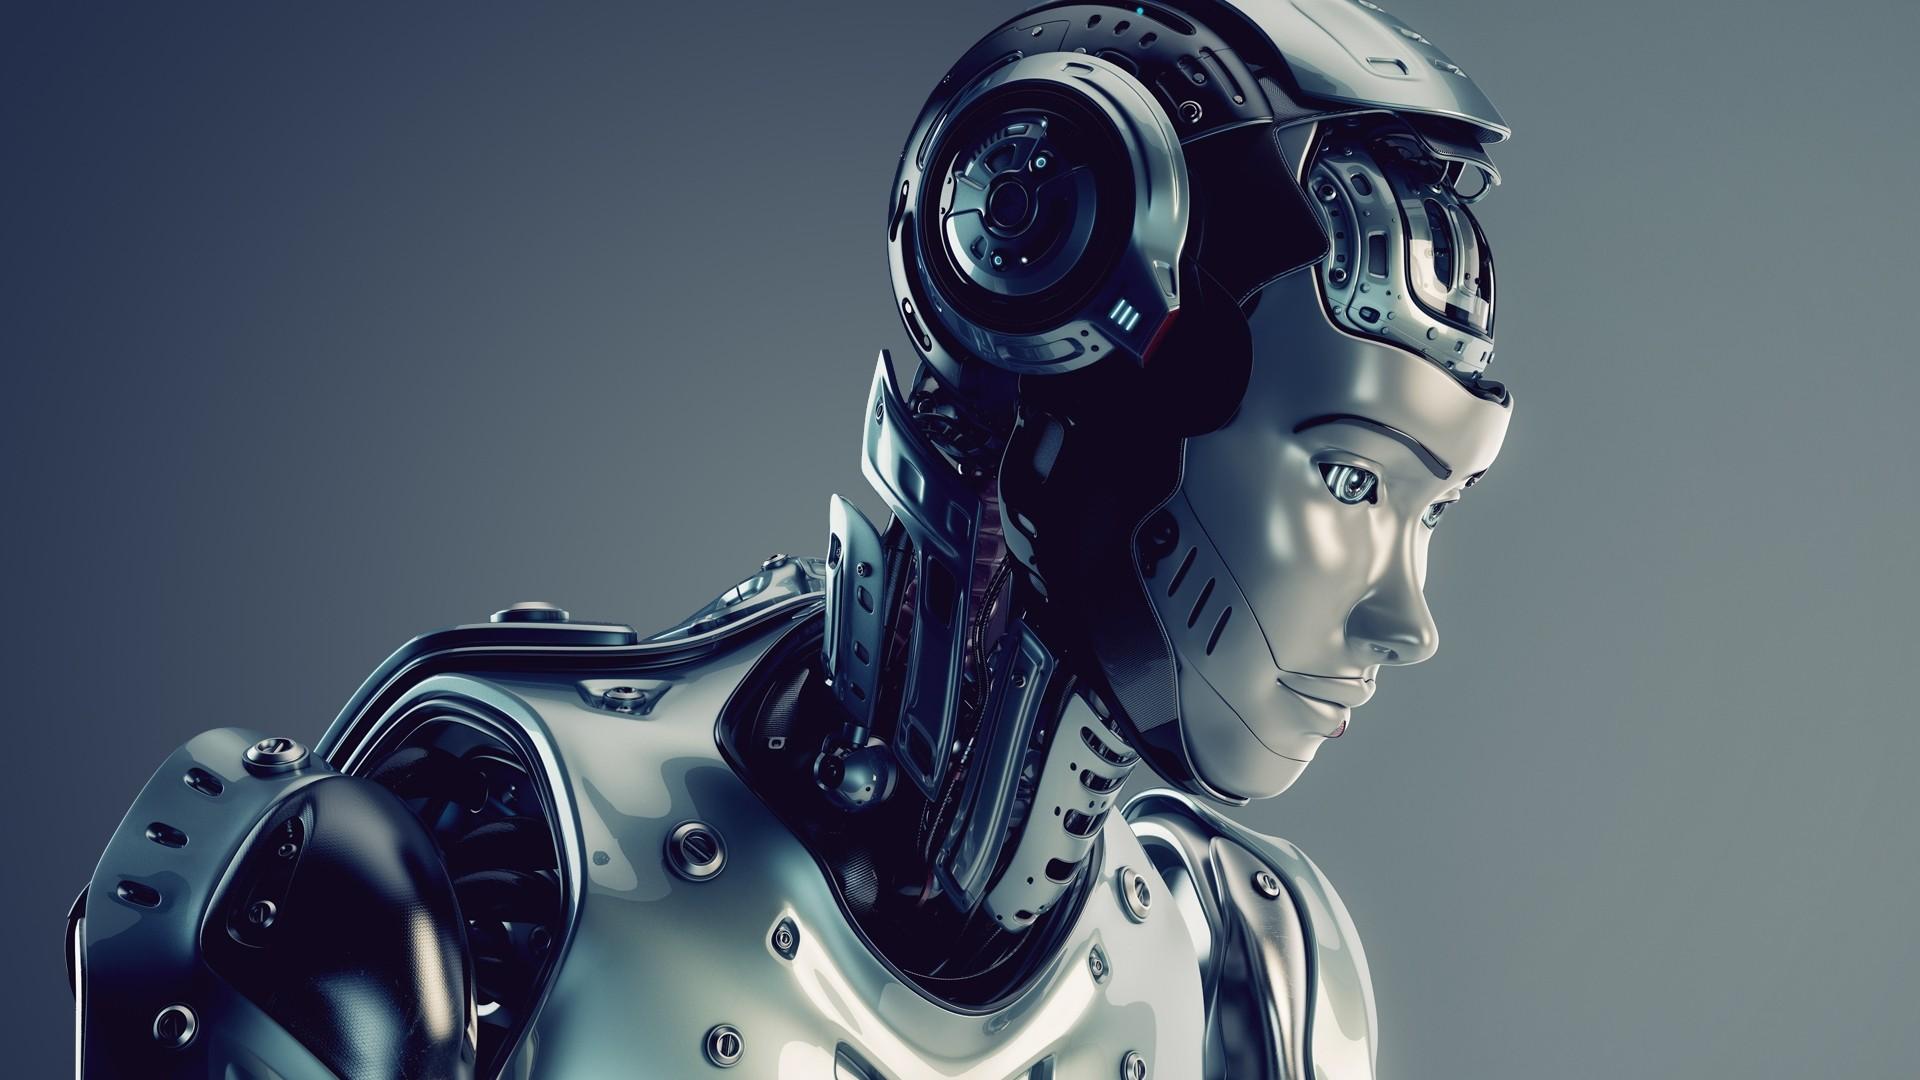 Robot hd wallpaper download